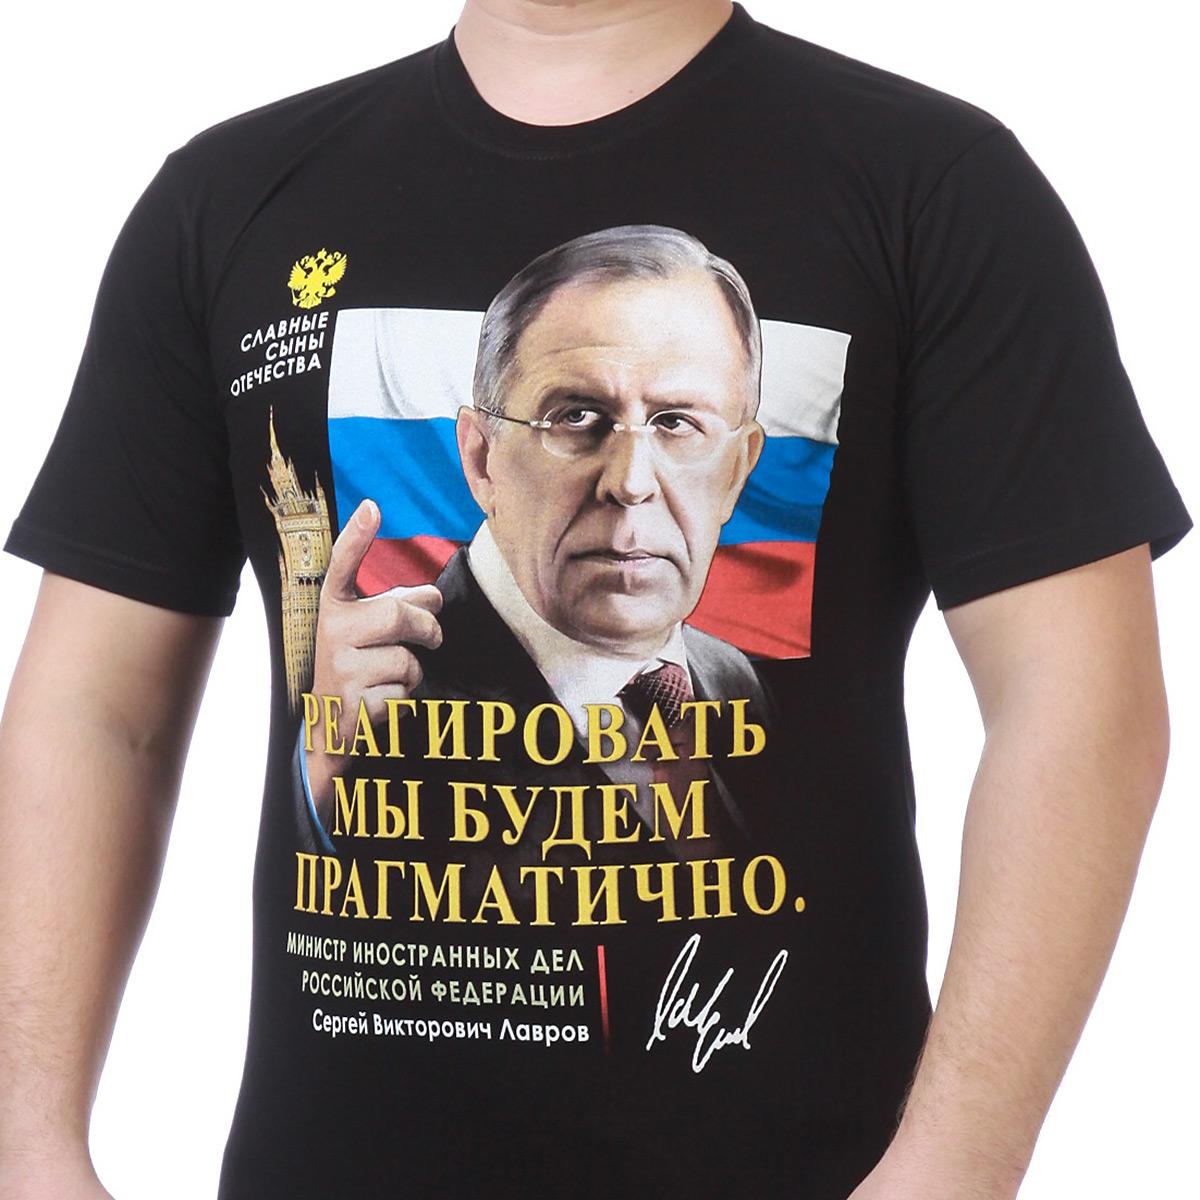 Футболки с Лавровым Футболки с цитатами Лаврова в подарок на заказ